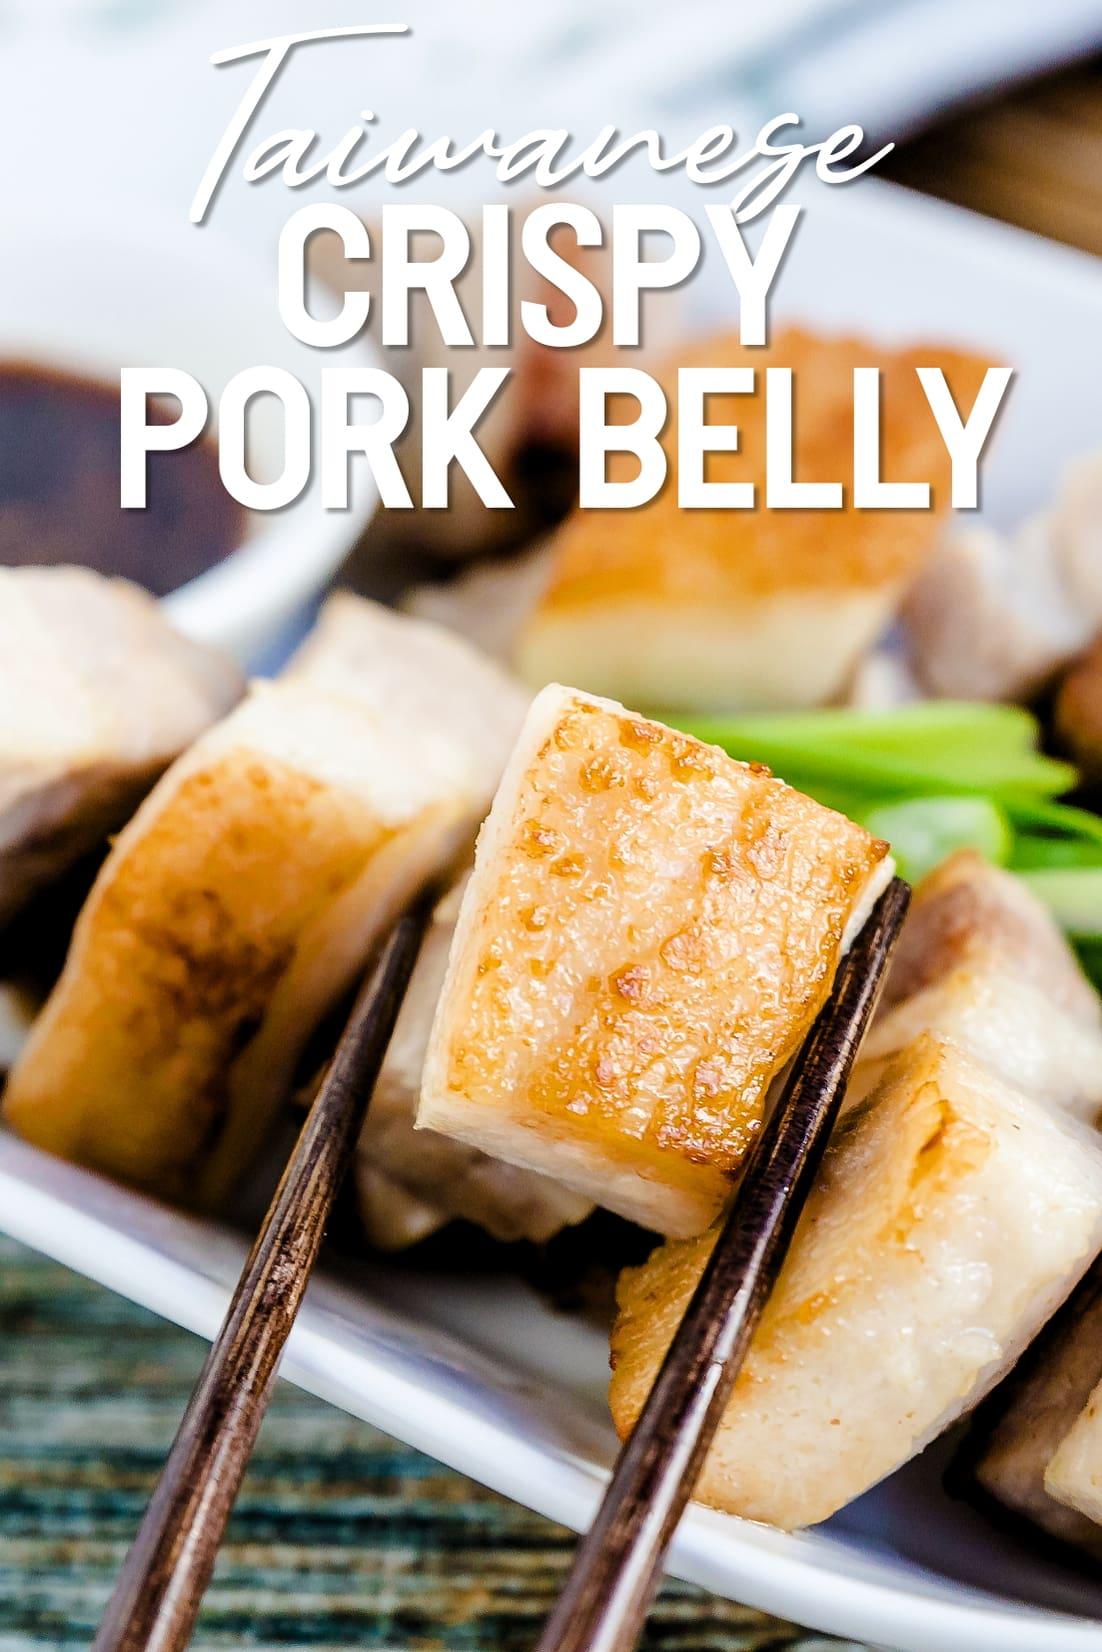 Taiwanese Crispy Pork Belly with chopsticks